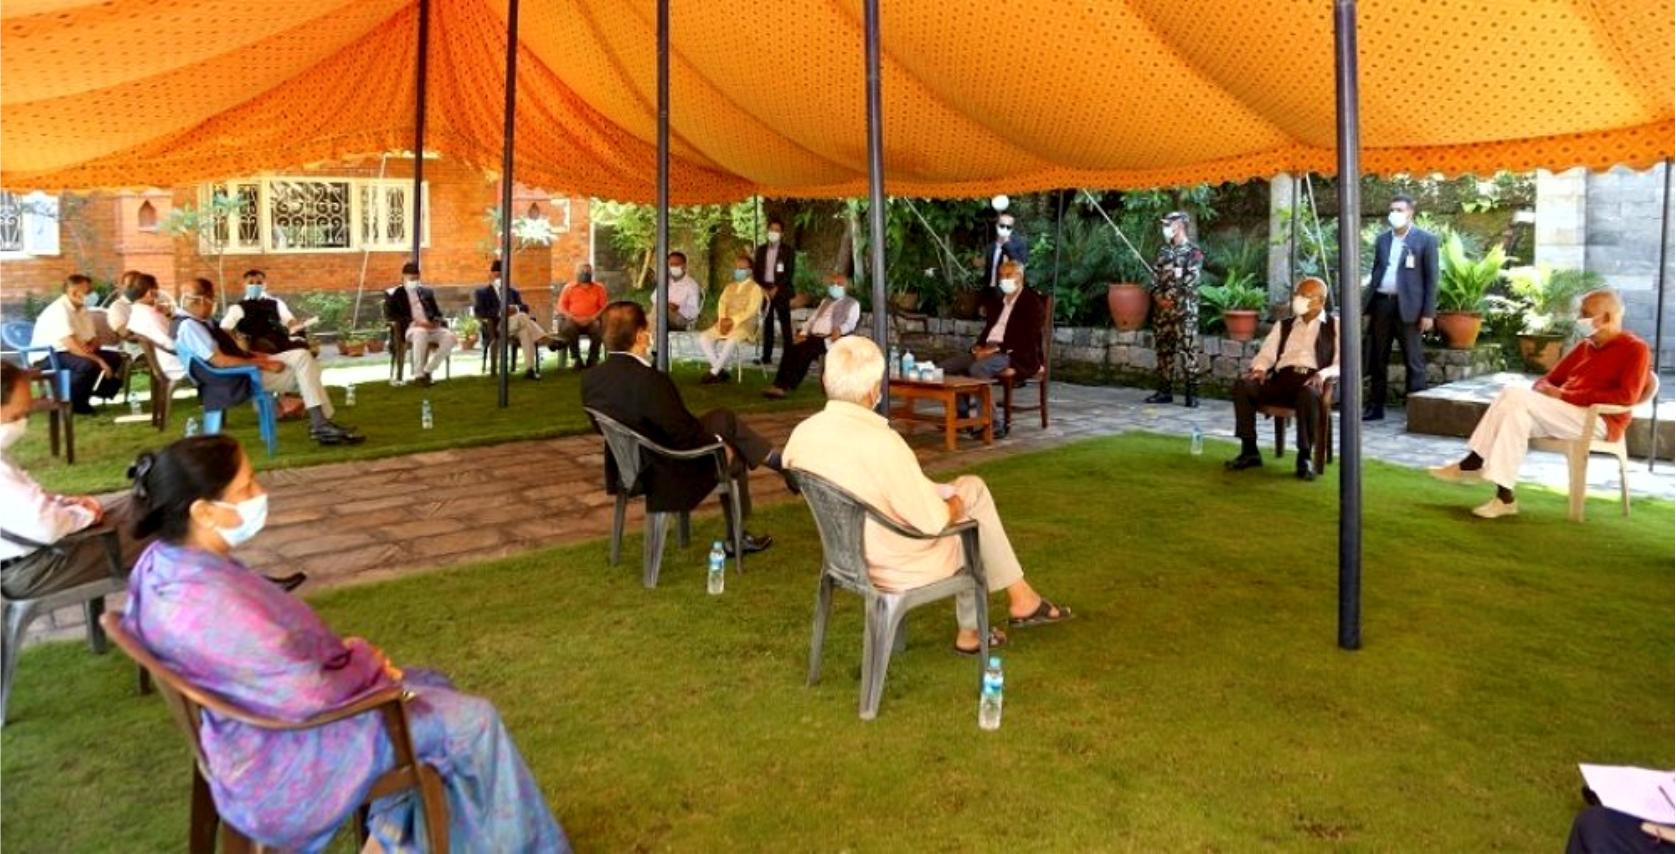 नेपाली कांग्रेसको तल्लो तहका सबै अधिवेशन स्थगित